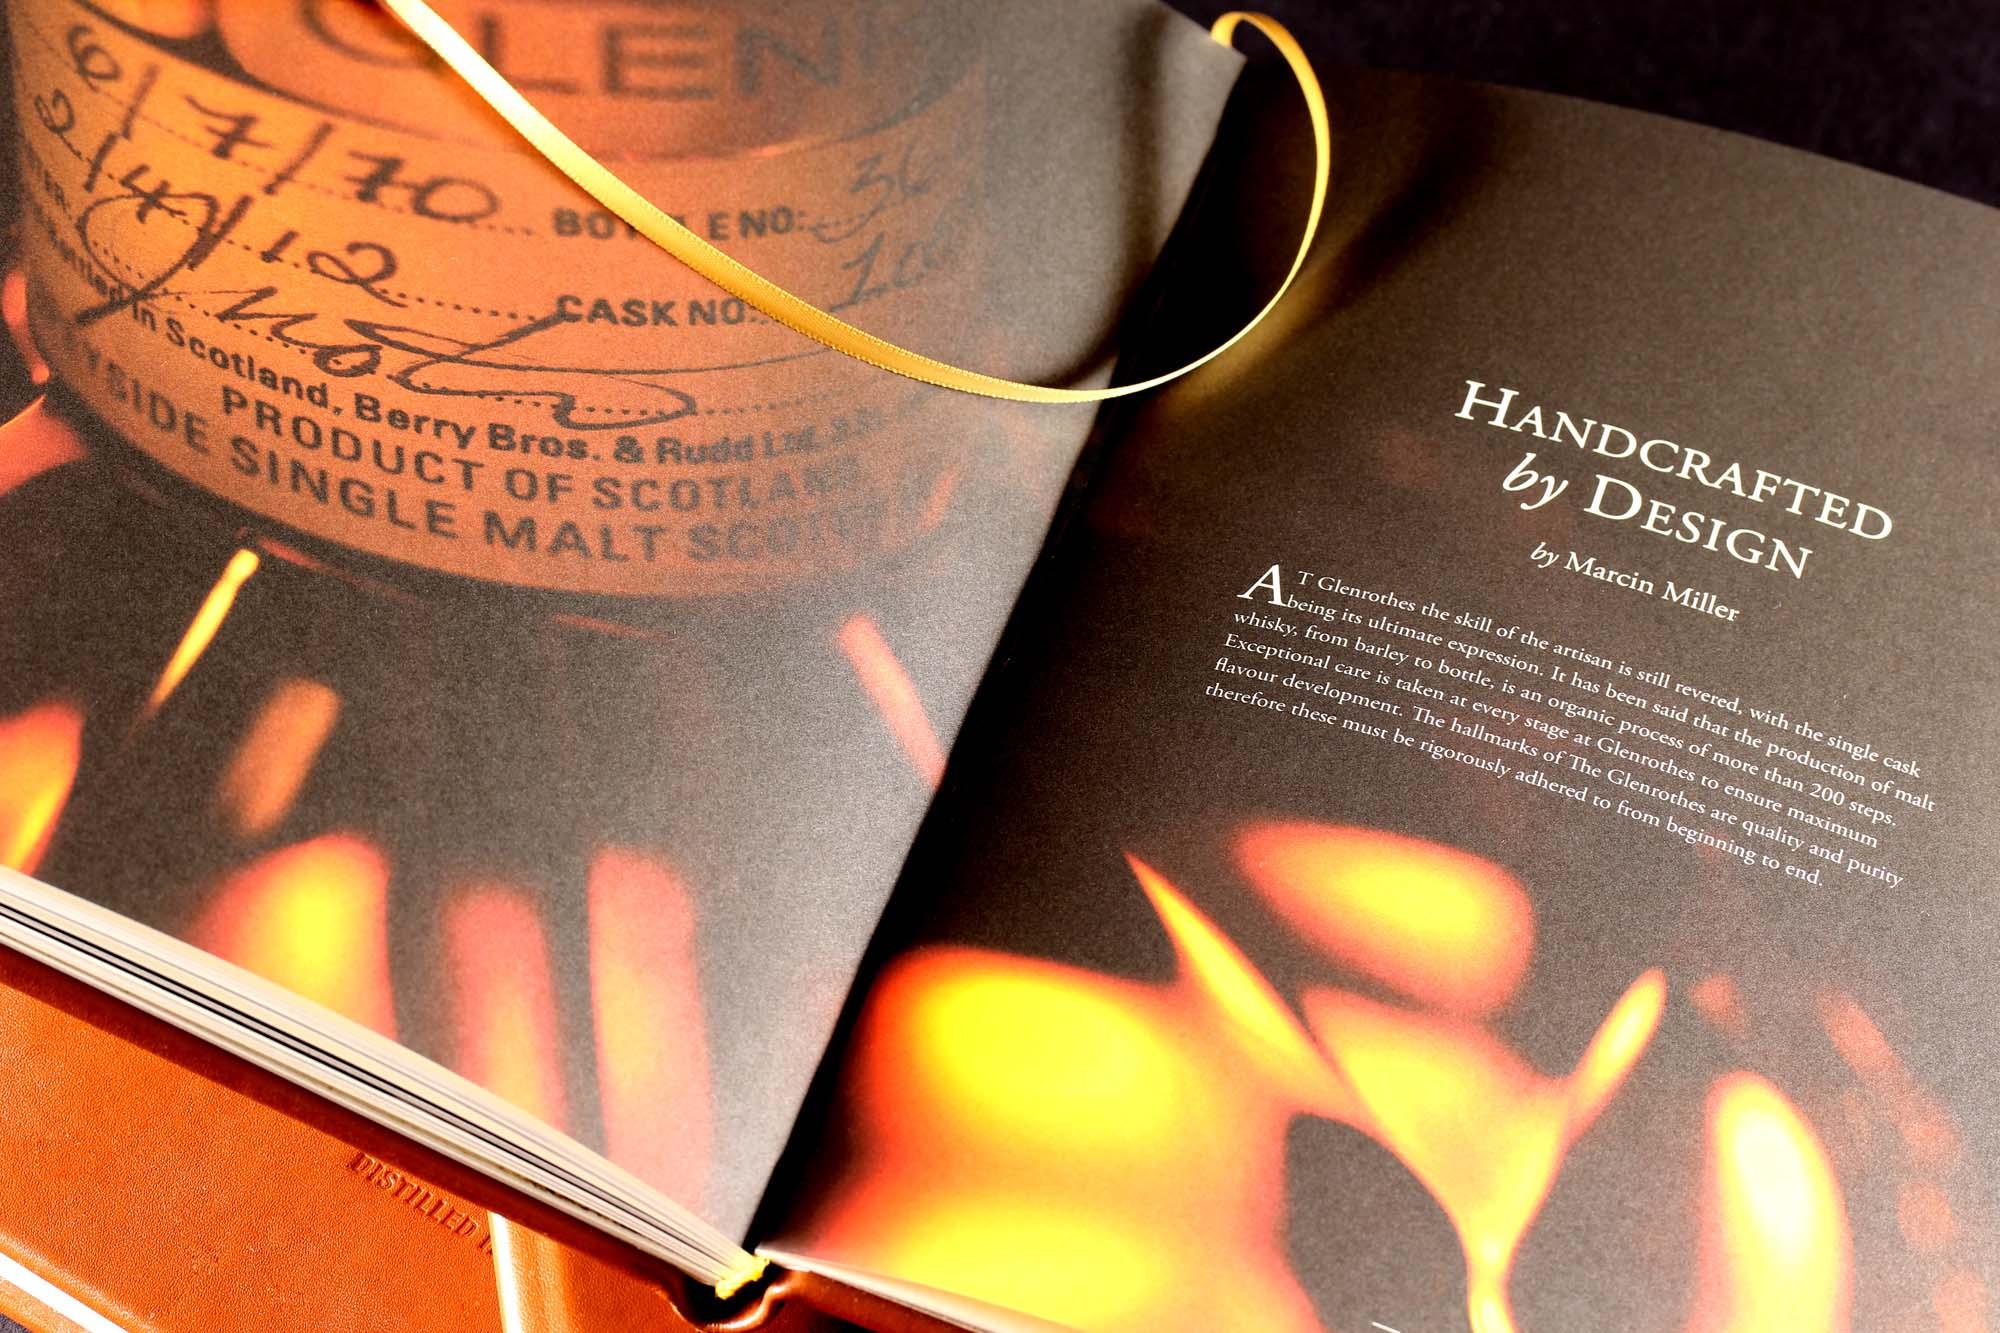 07_Duncan_book_01_HR